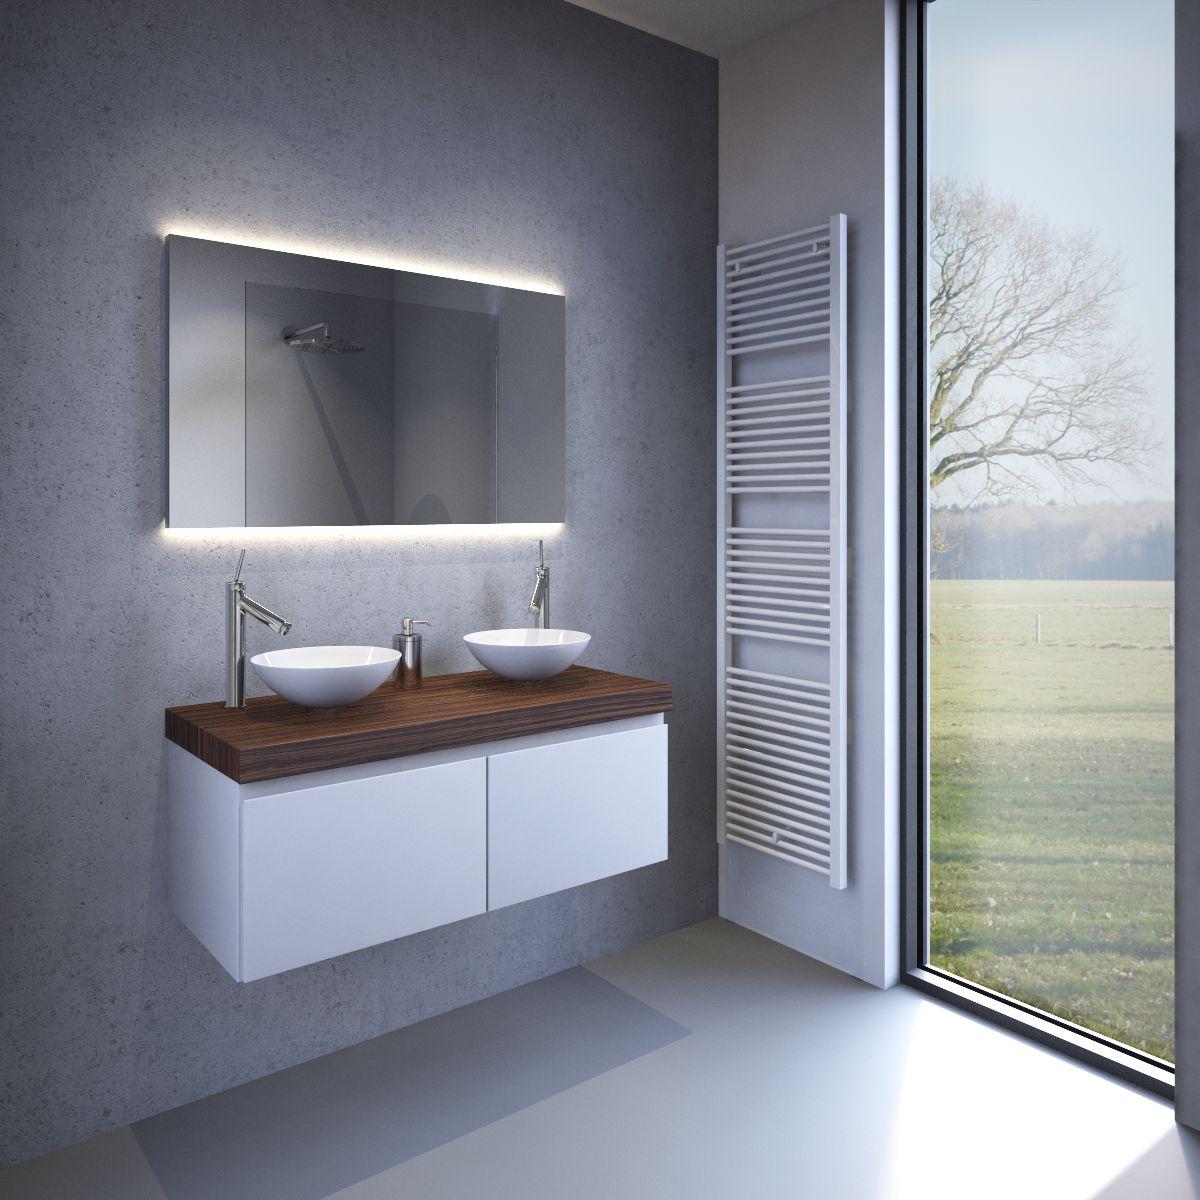 Design badkamer spiegel met indirect strijklicht en for Verlichting badkamerspiegel